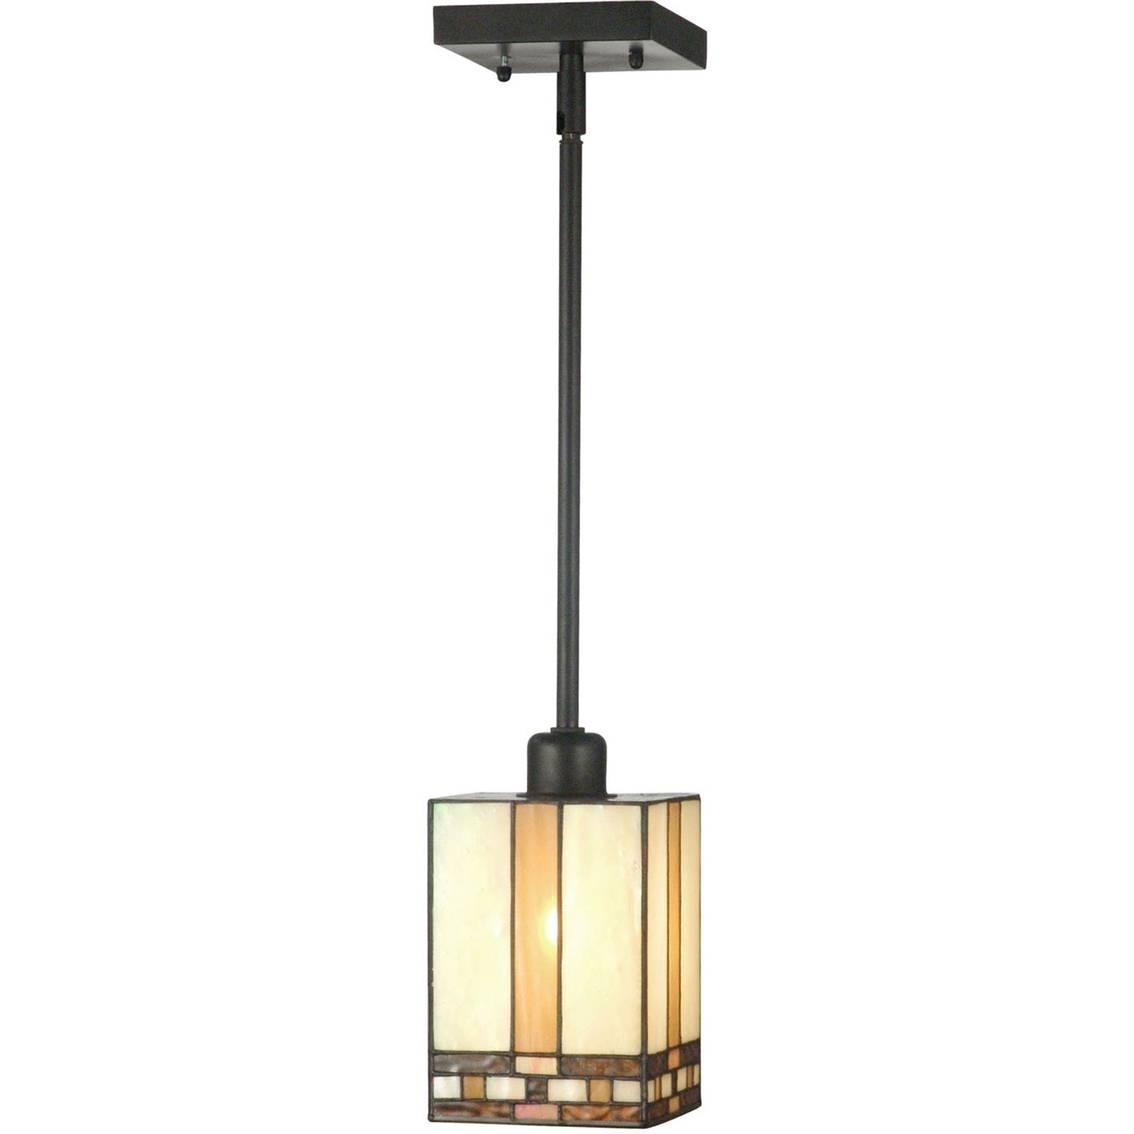 Dale Tiffany Mission Mini Pendant Lamp | Ceiling Lights | Home throughout Tiffany Mini Pendant Lights (Image 5 of 15)